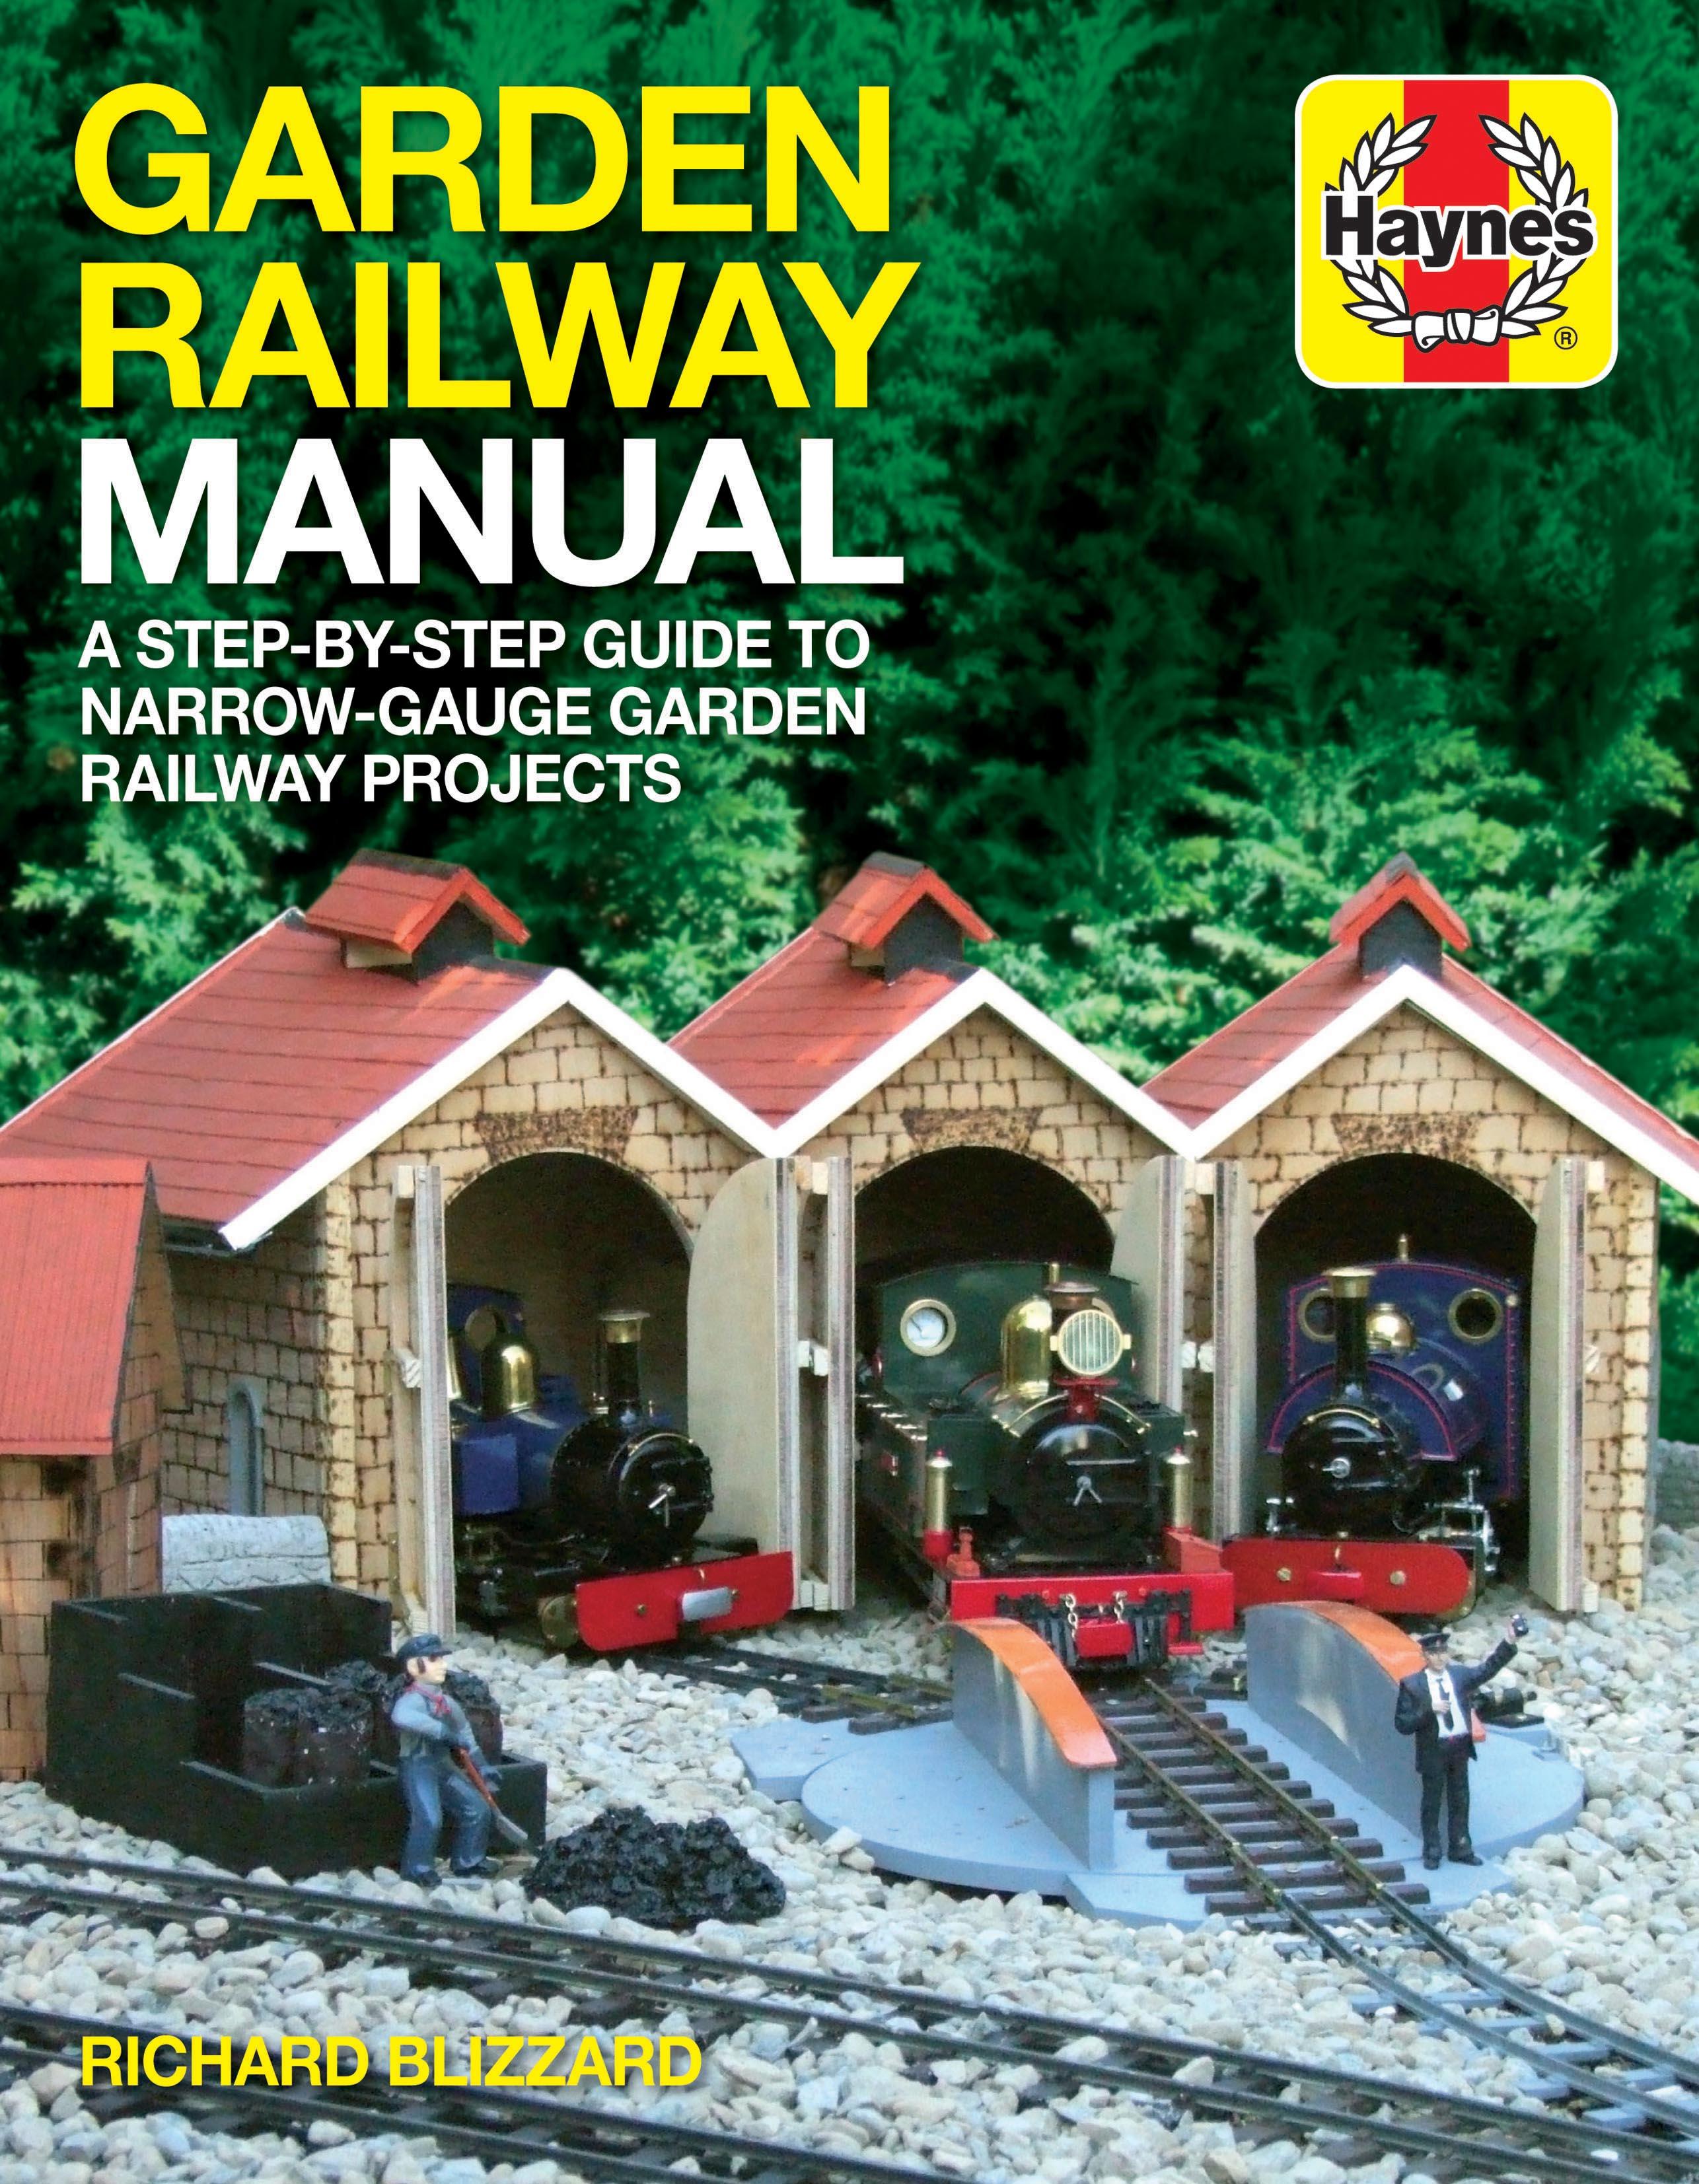 Garden Railway Manual (Paperback)